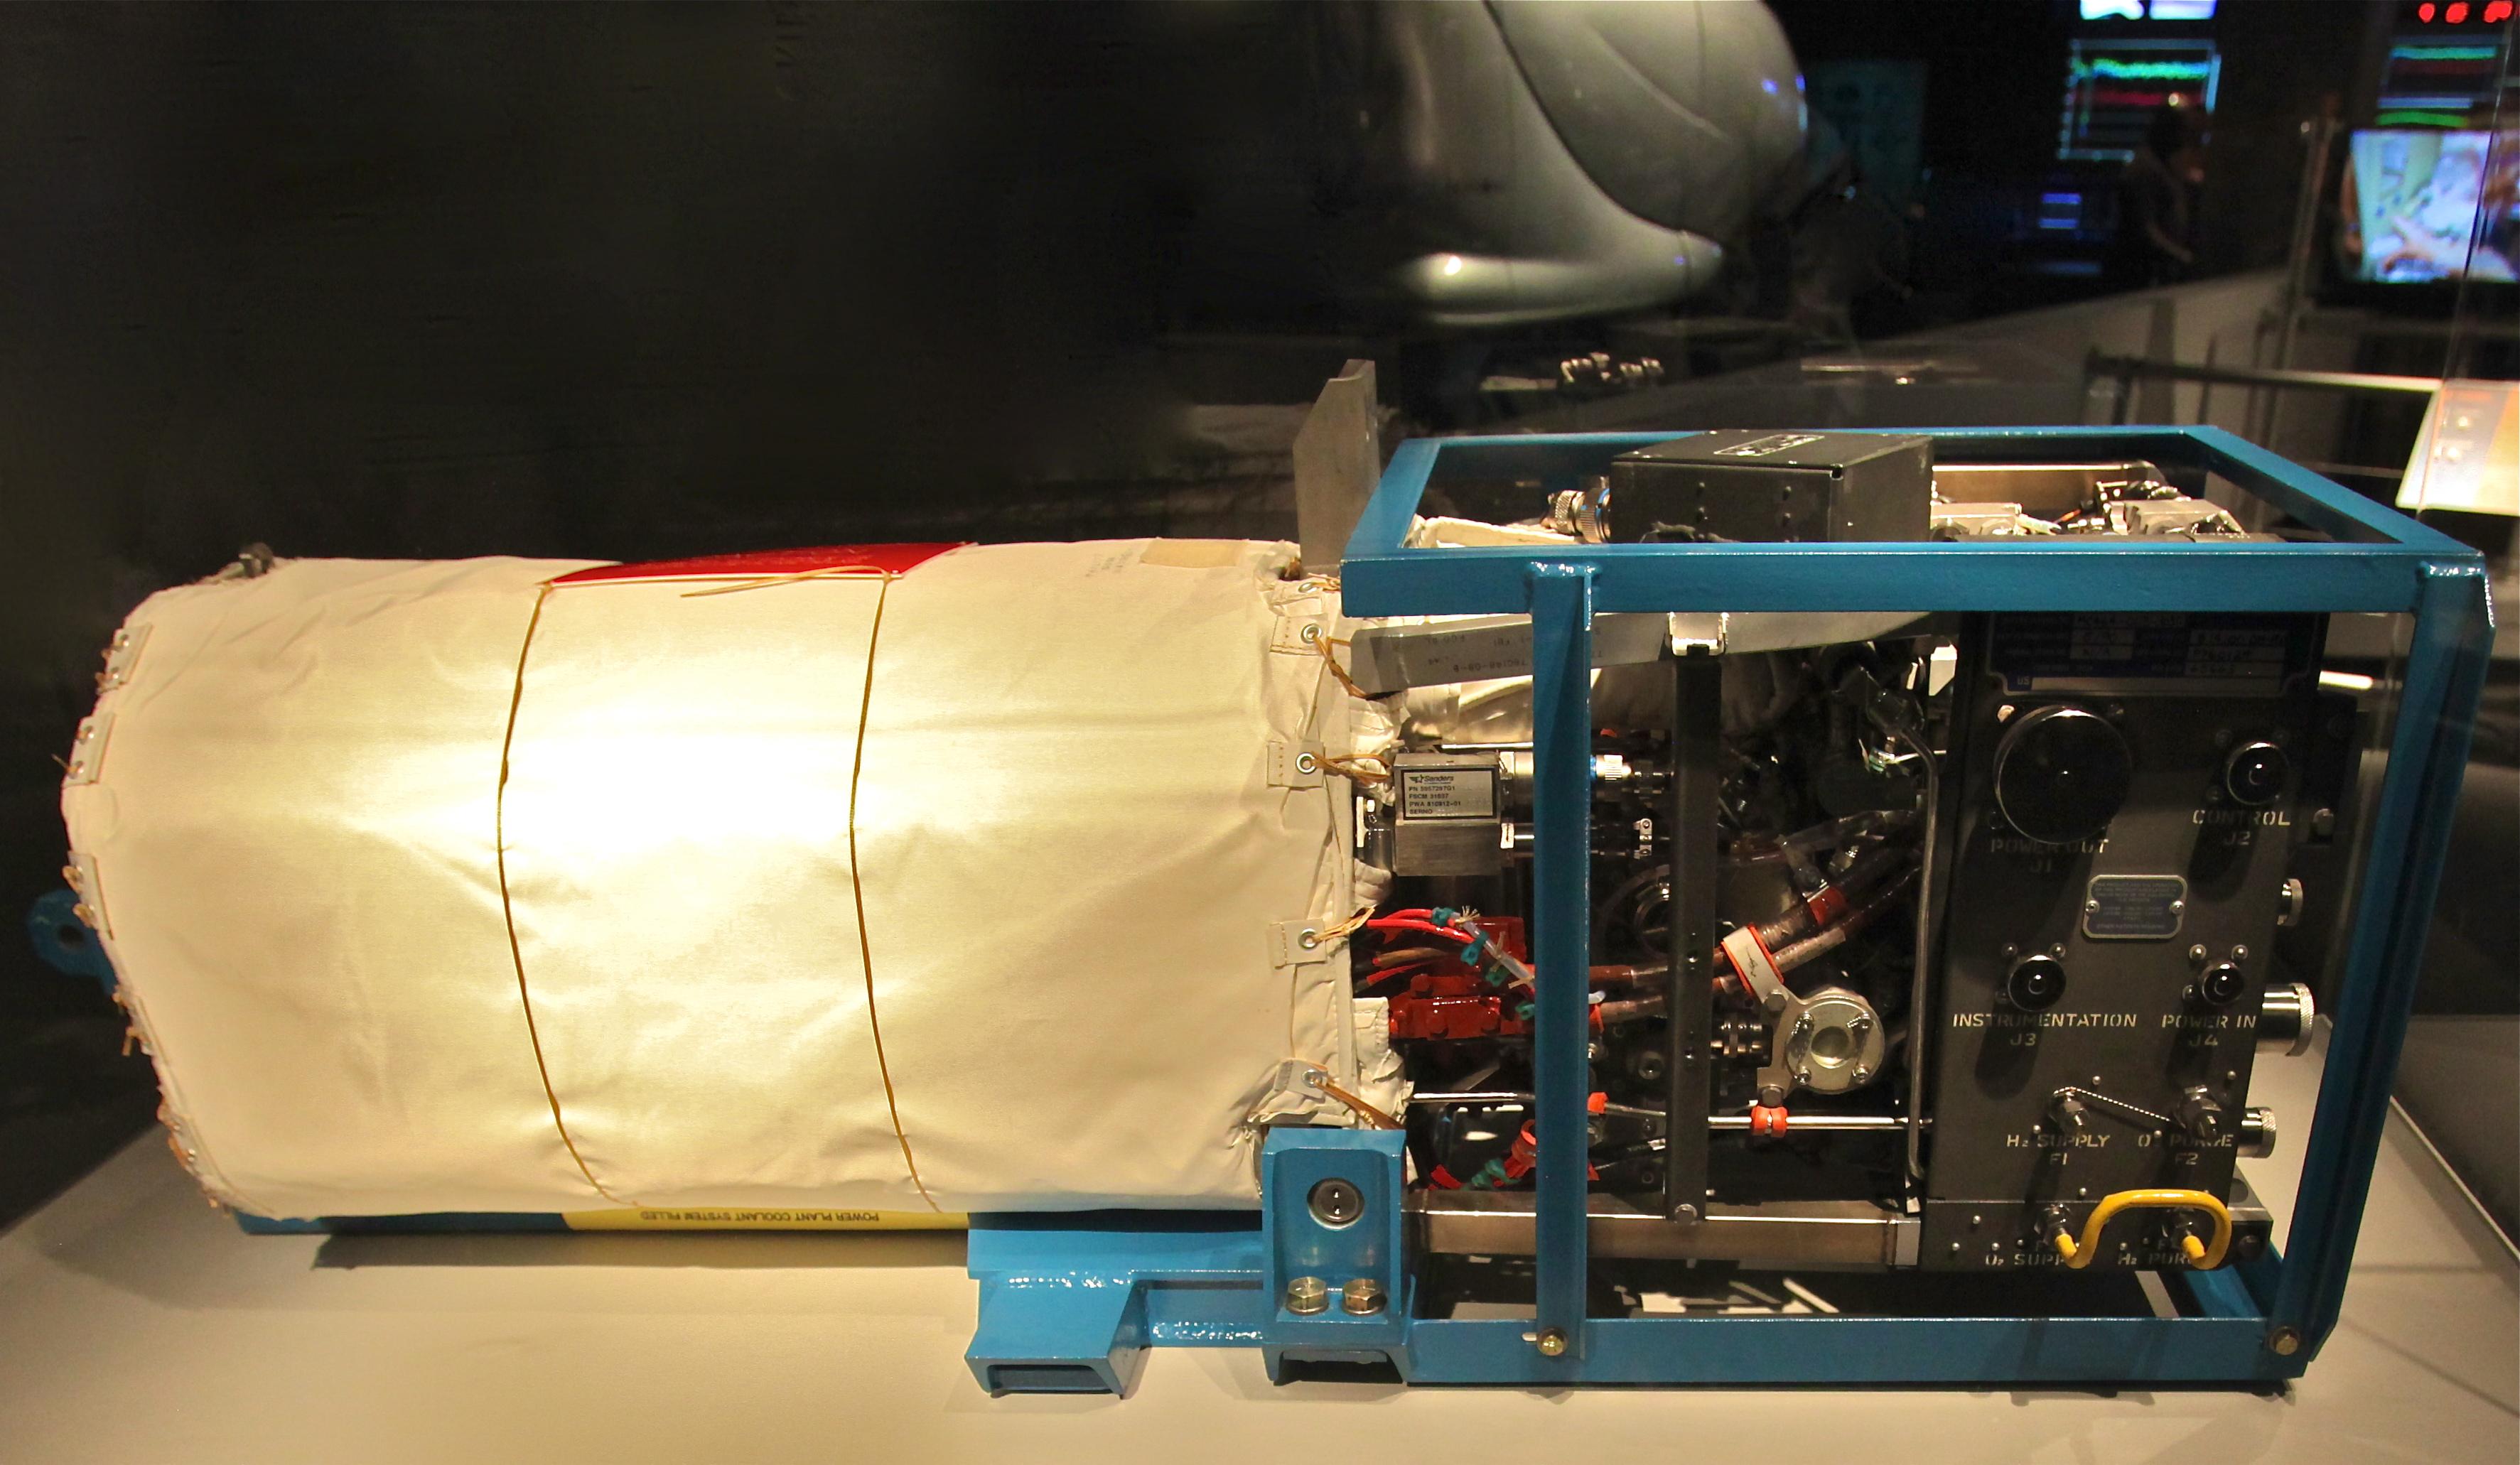 nasa fuel cells - photo #11